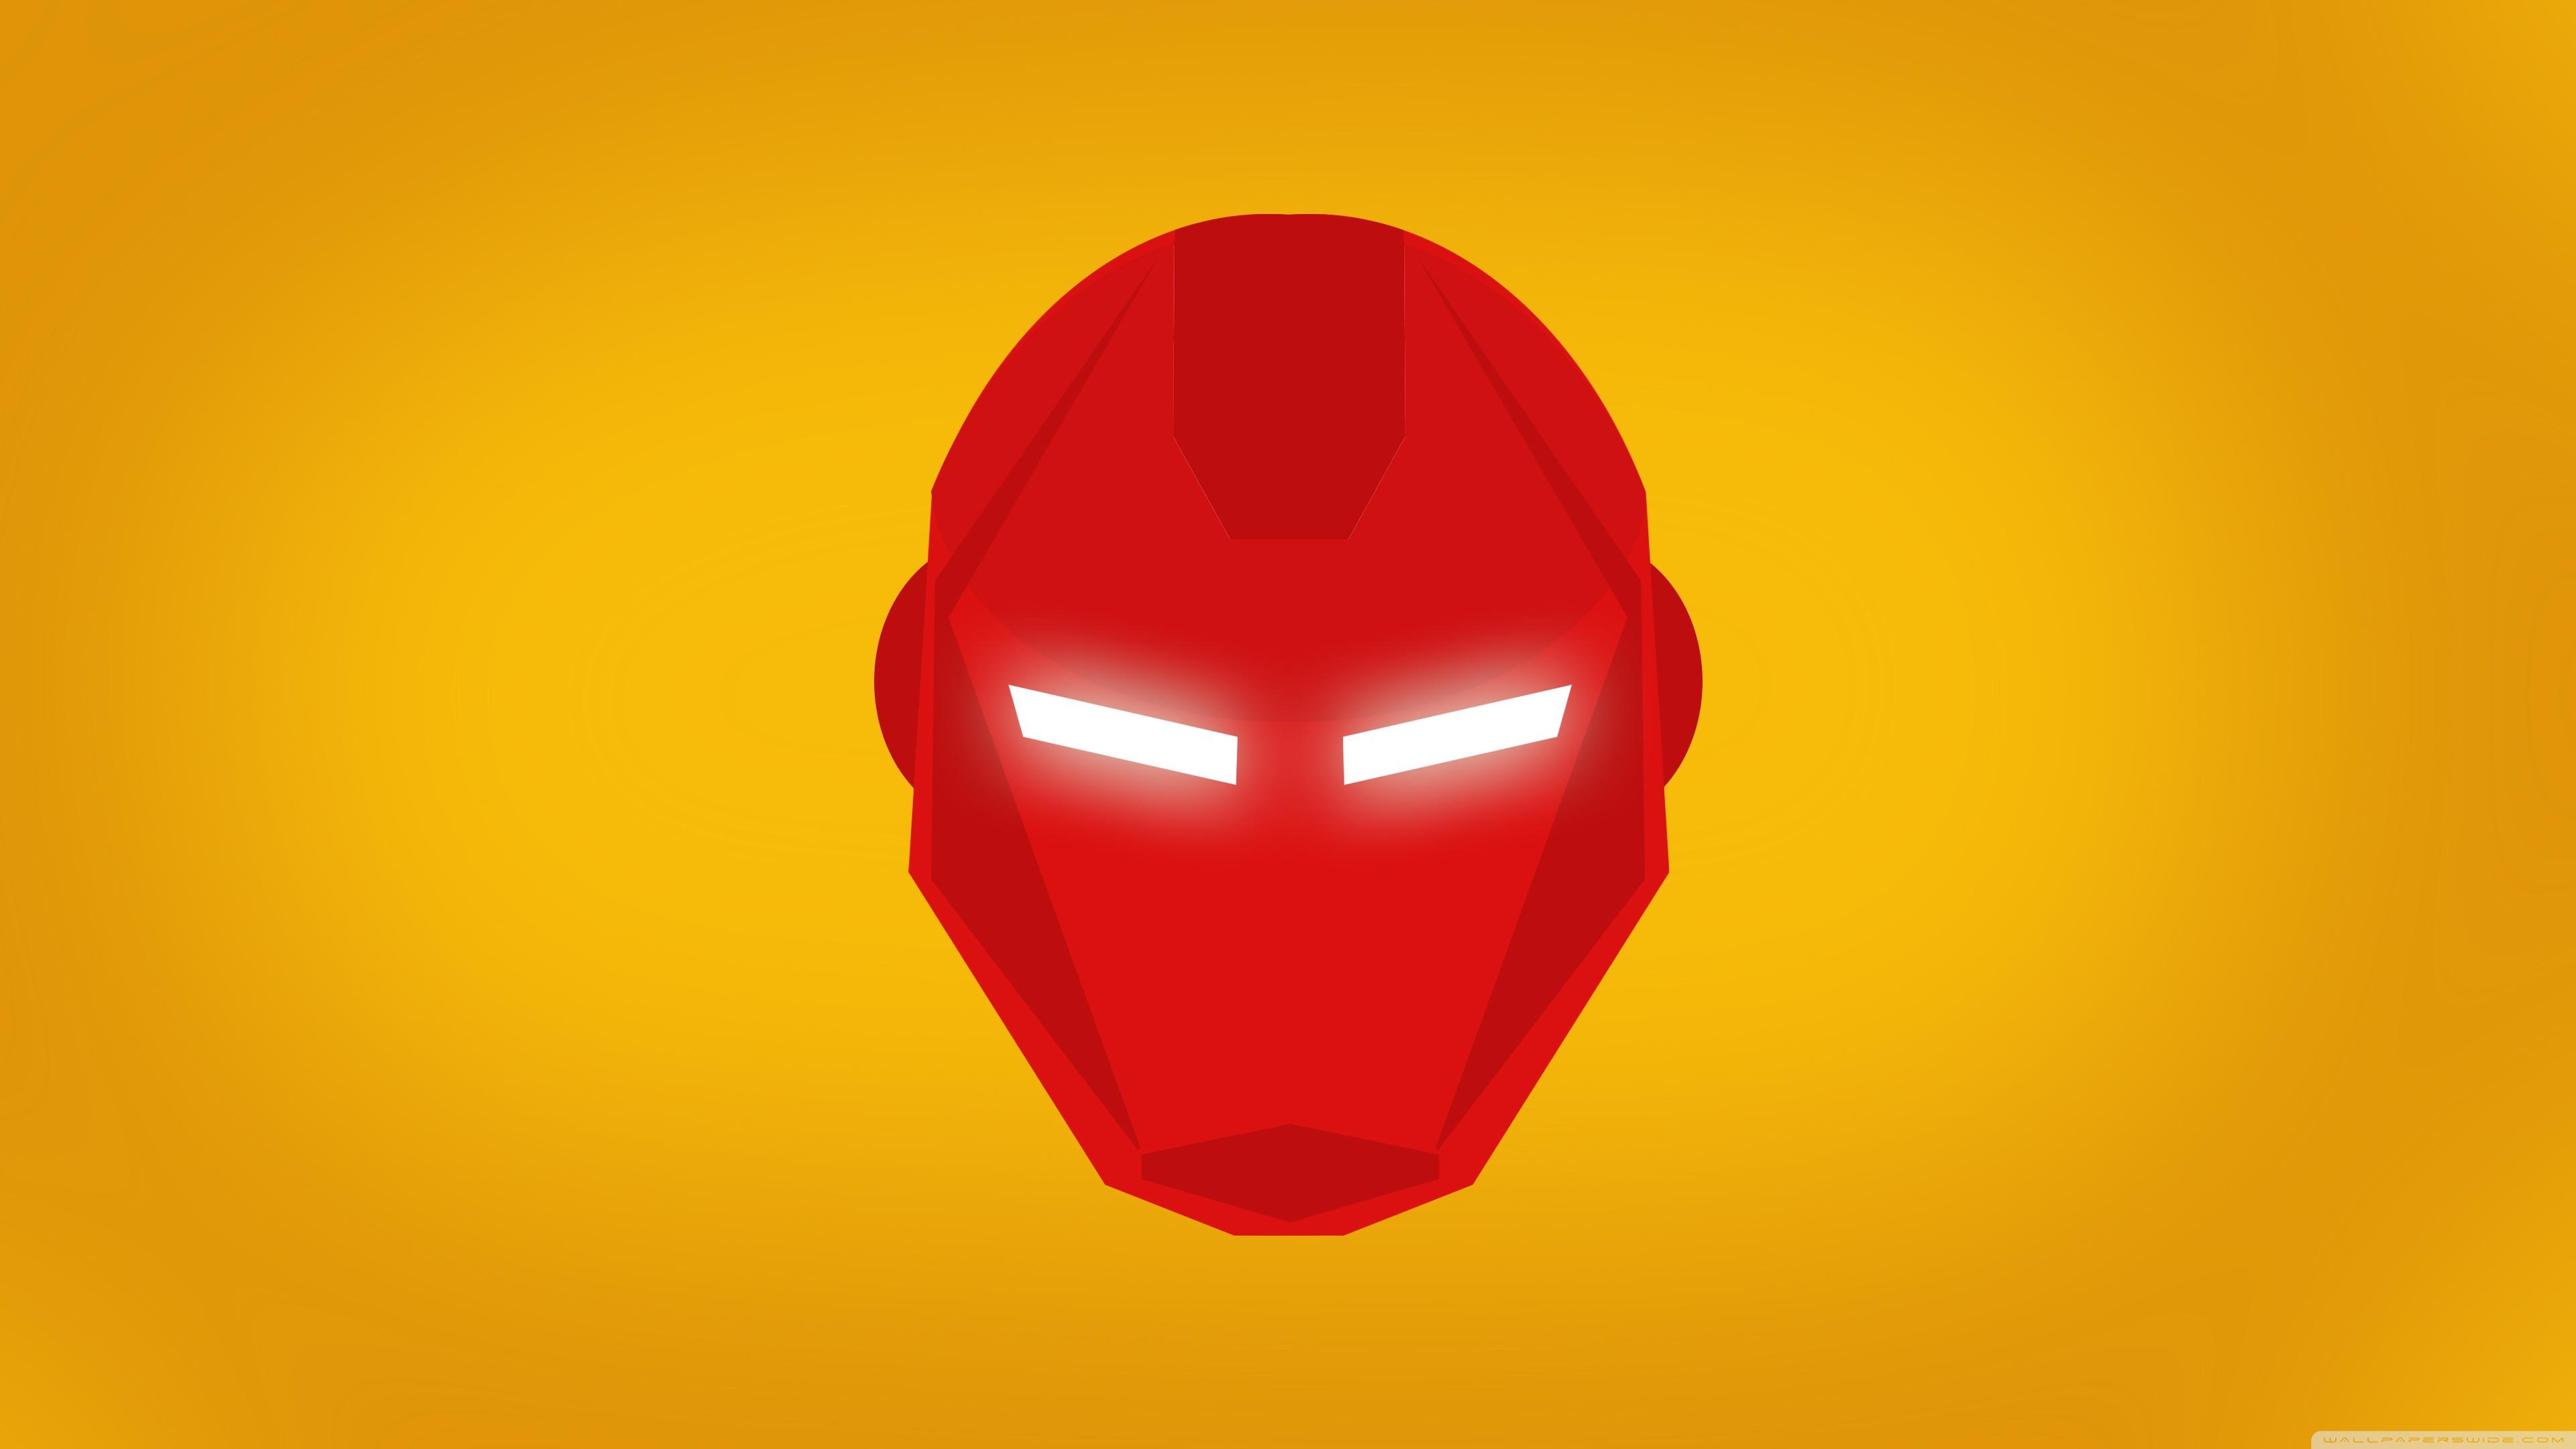 Iron Man Wallpaper 34447: Iron Man 4k Ultra HD Wallpaper And Background Image